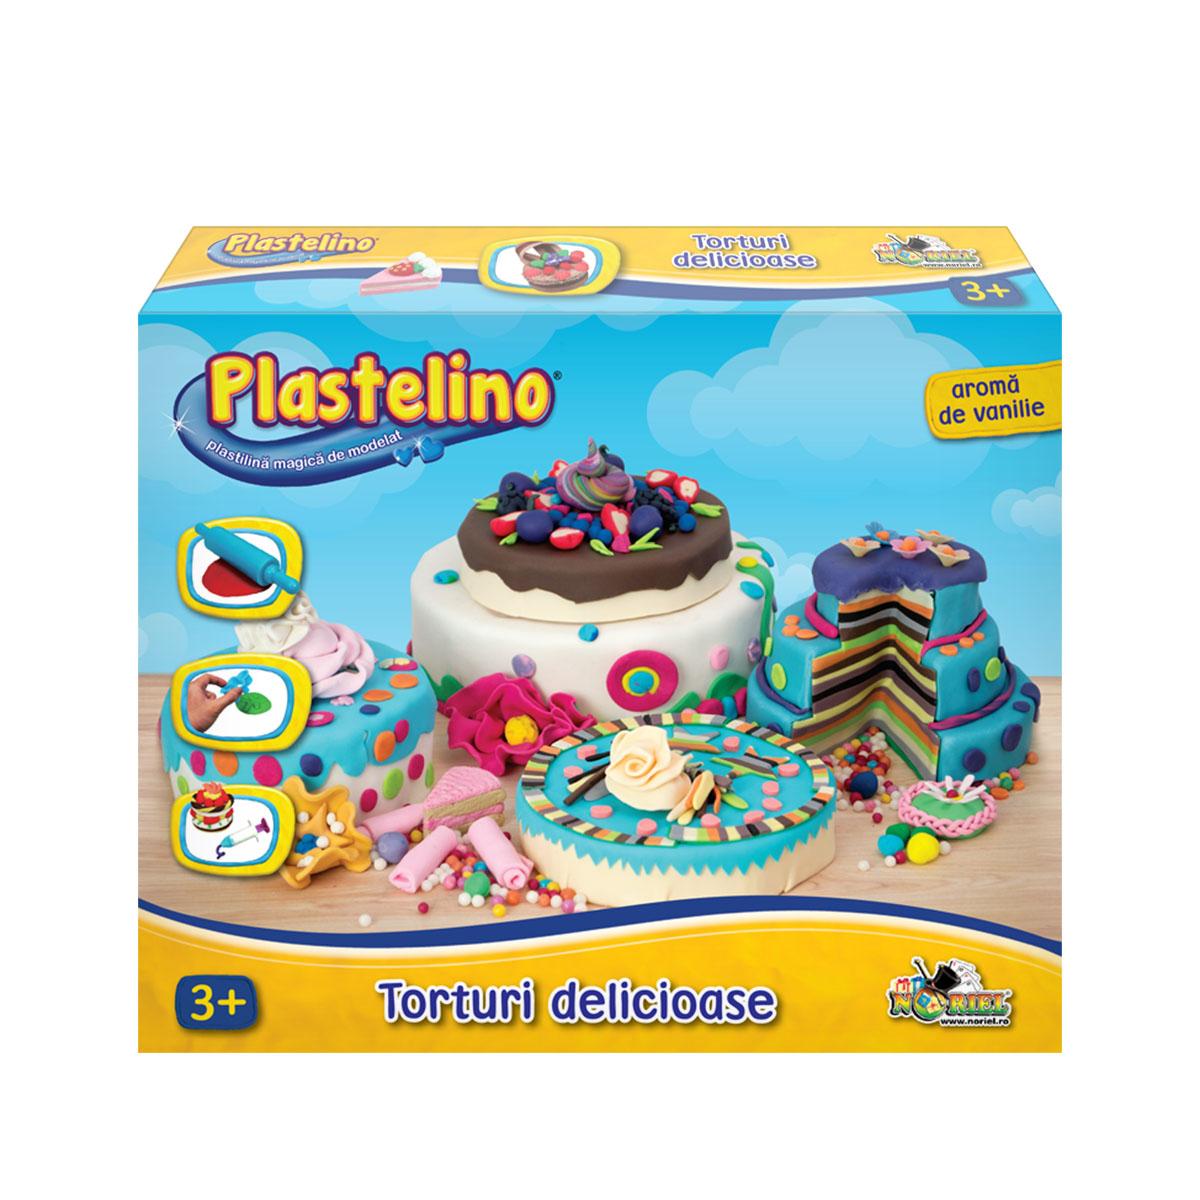 Plastelino - Torturi delicioase din plastilina II